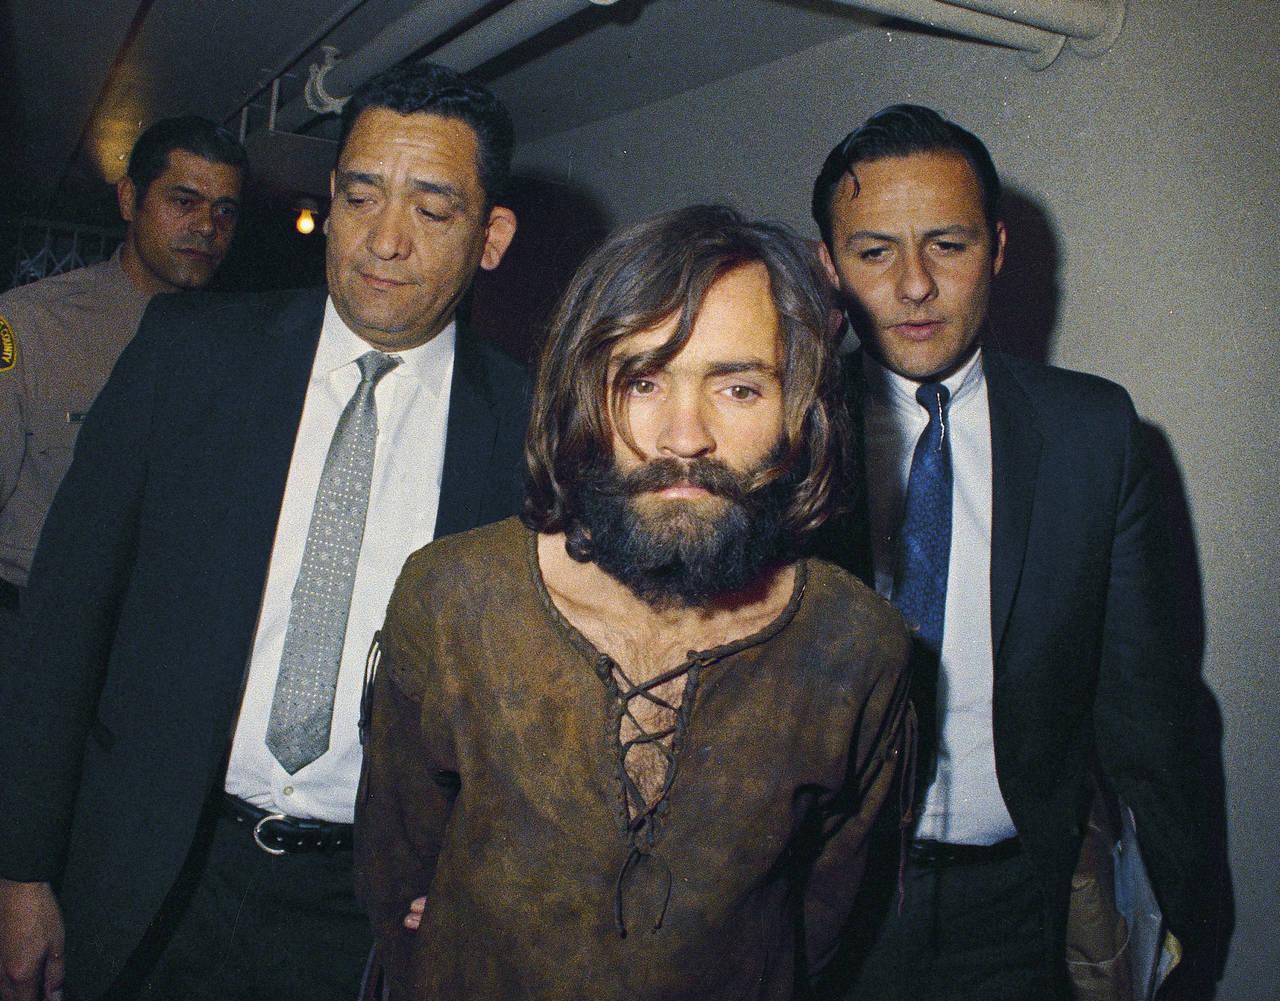 Muere el criminal Charles Manson